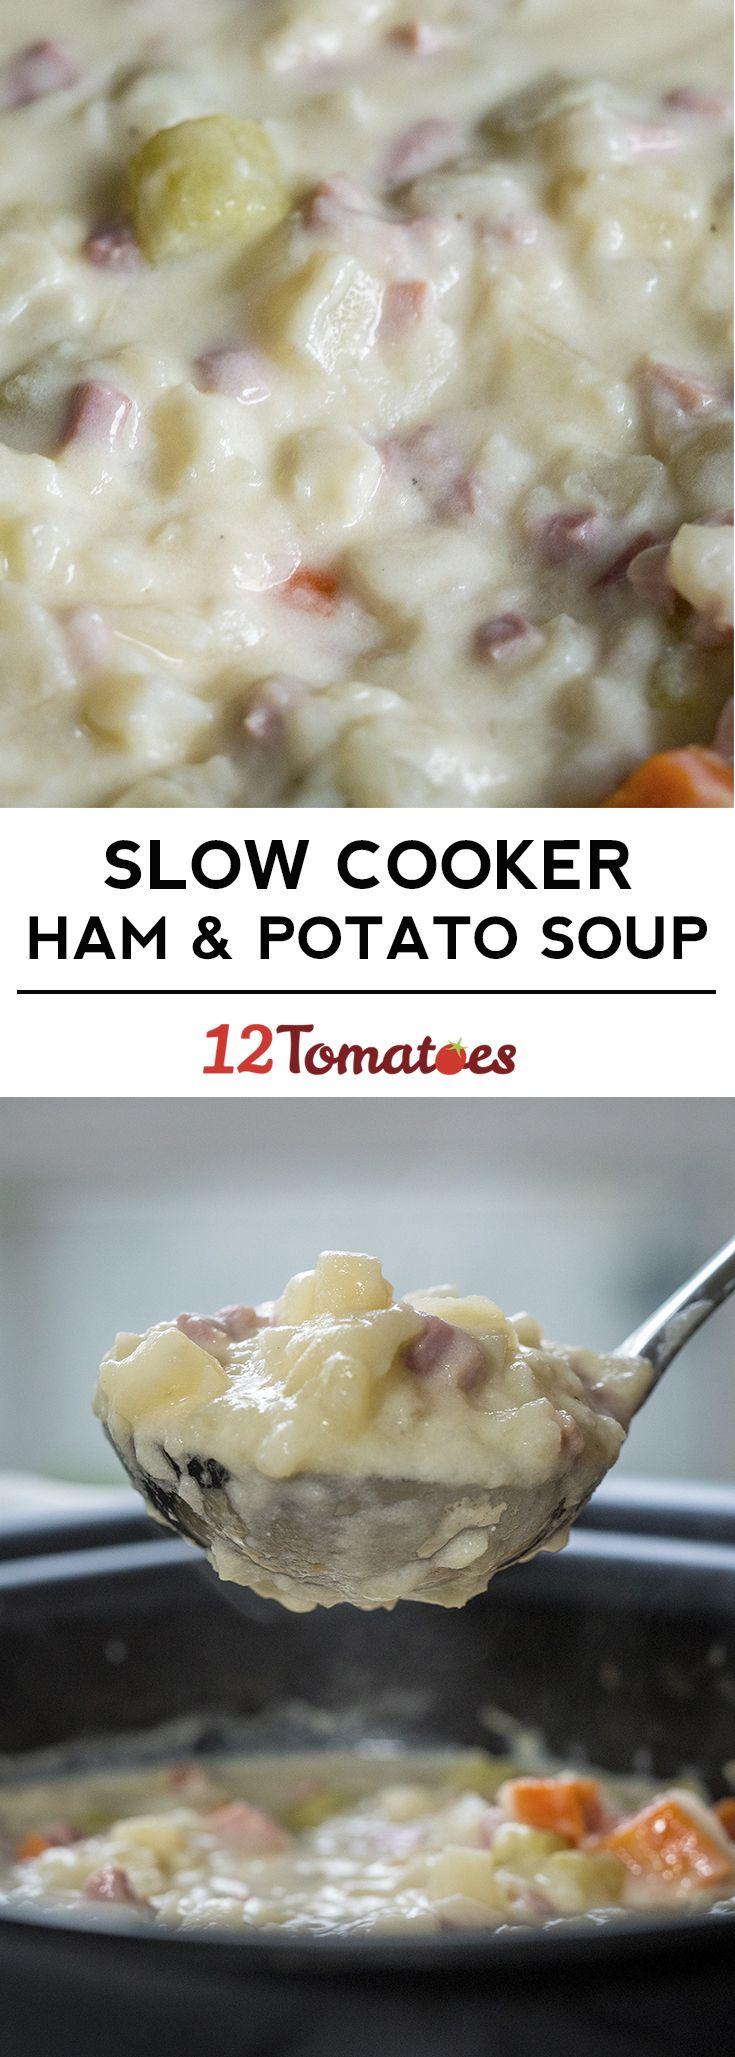 Slow Cooker Ham & Potato Soup